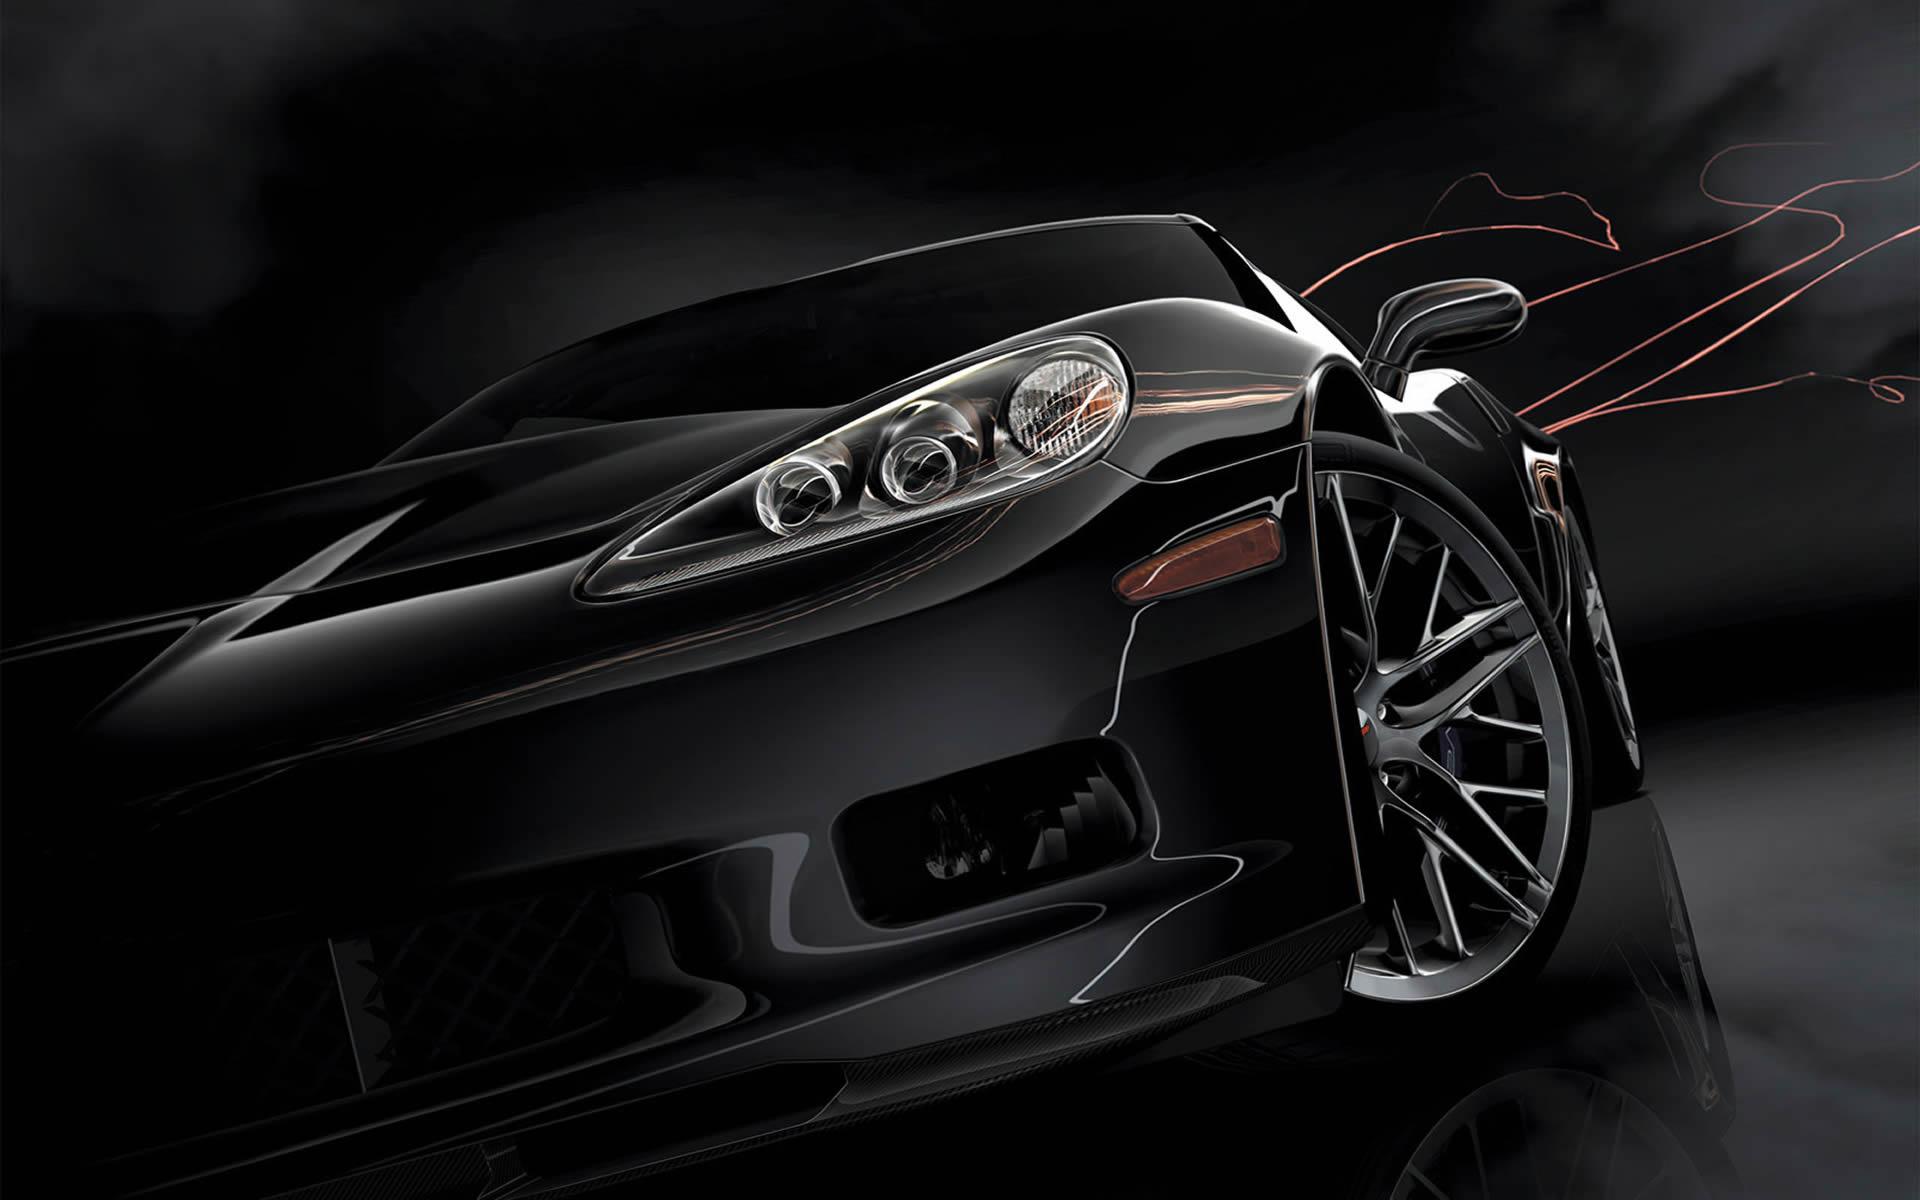 car wallpaper,land vehicle,vehicle,car,automotive design,luxury vehicle